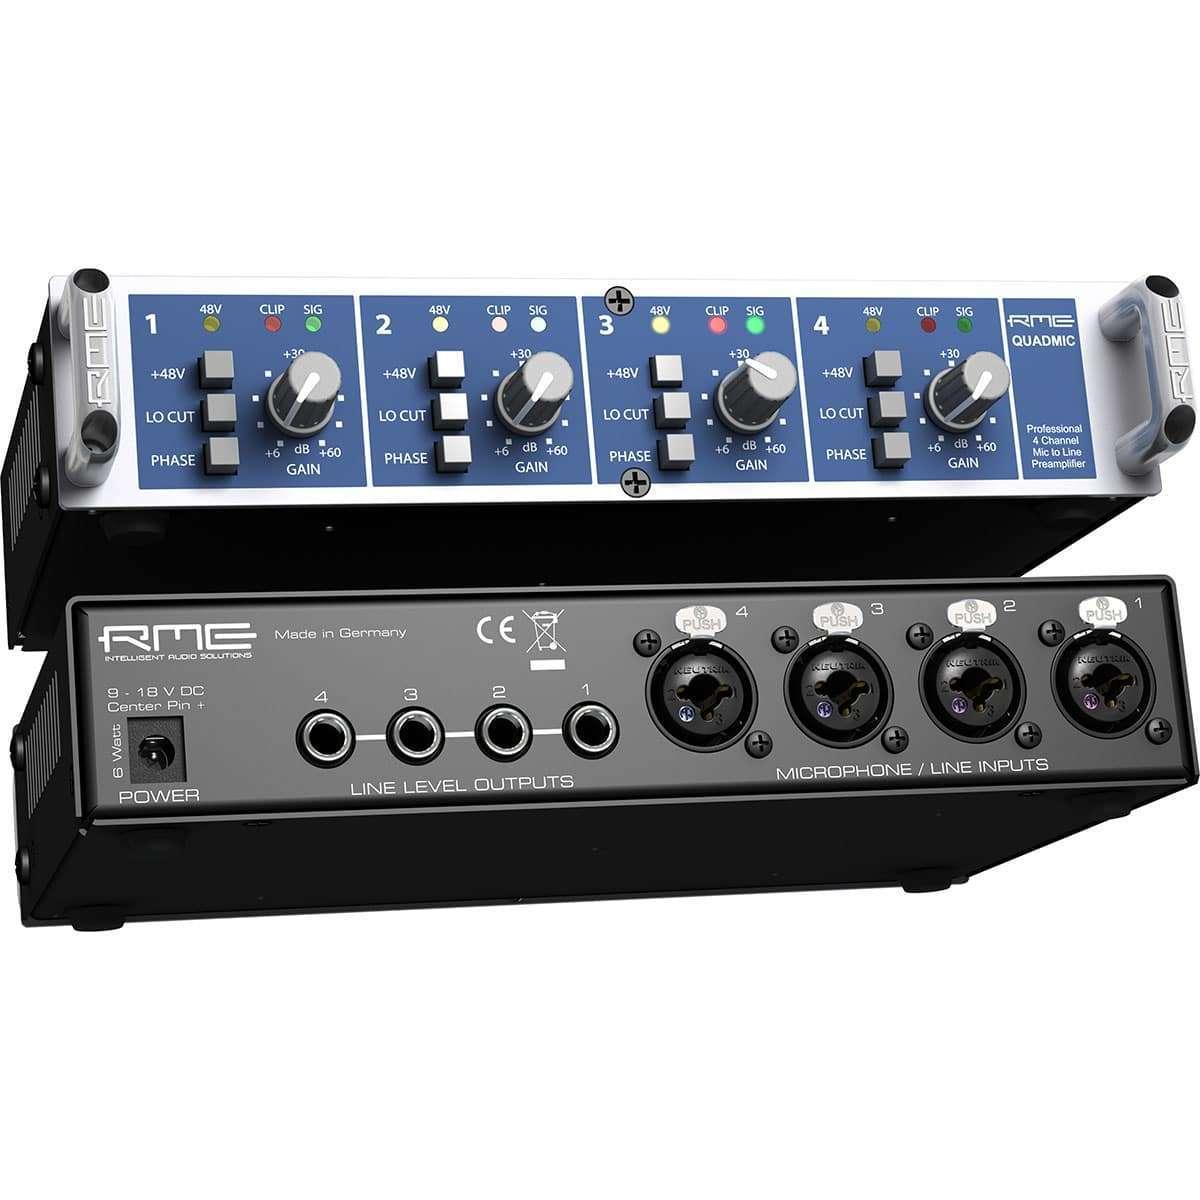 RME Quadmic II 04 Pro Audio, Outboard, Preamplificatori Microfonici